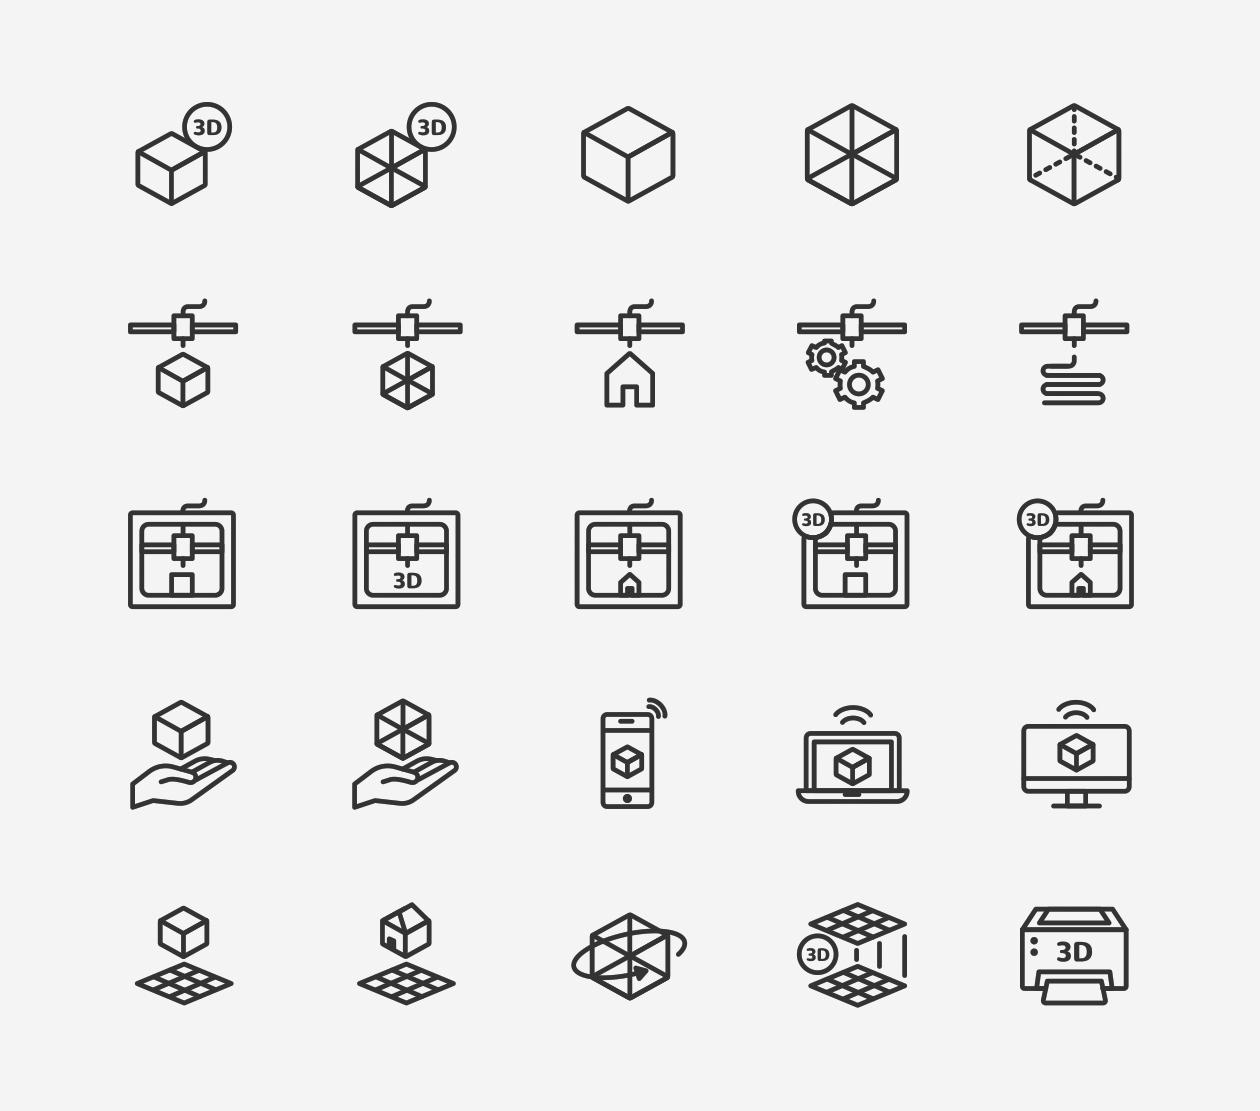 3d Printing Amp Printer Icons